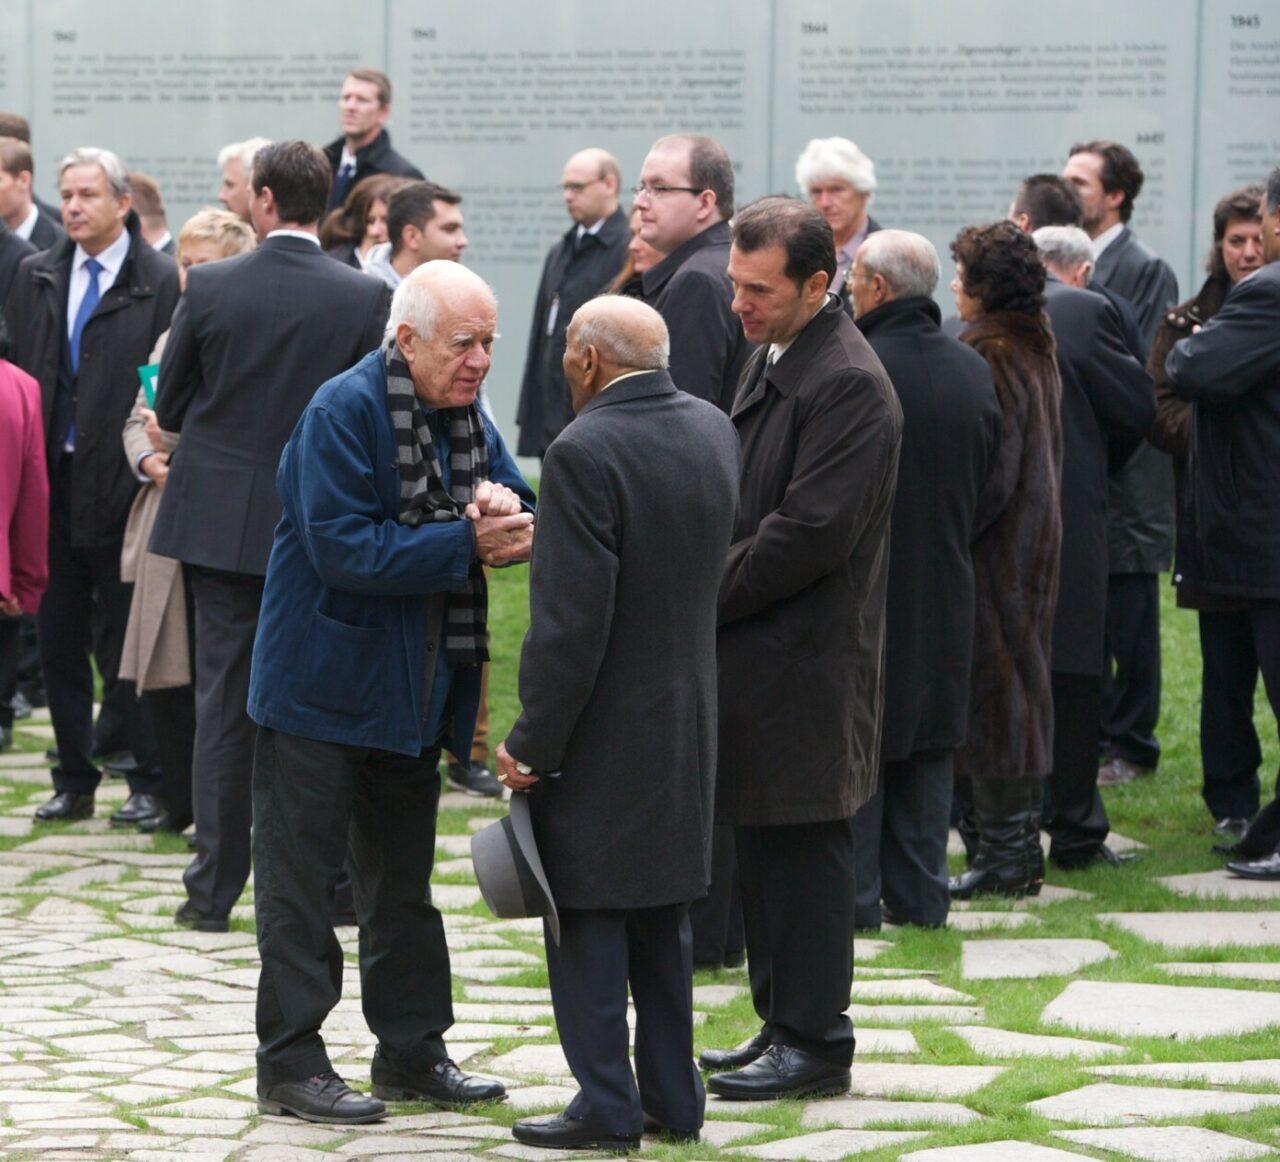 Einweihung Mahnmal Sinti und Roma